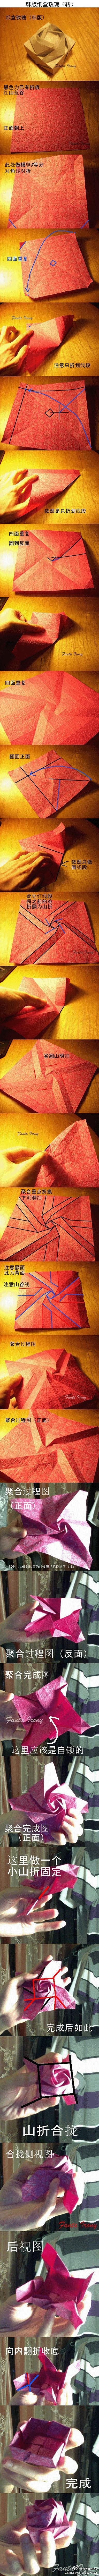 DIY origami paper box top with rose design